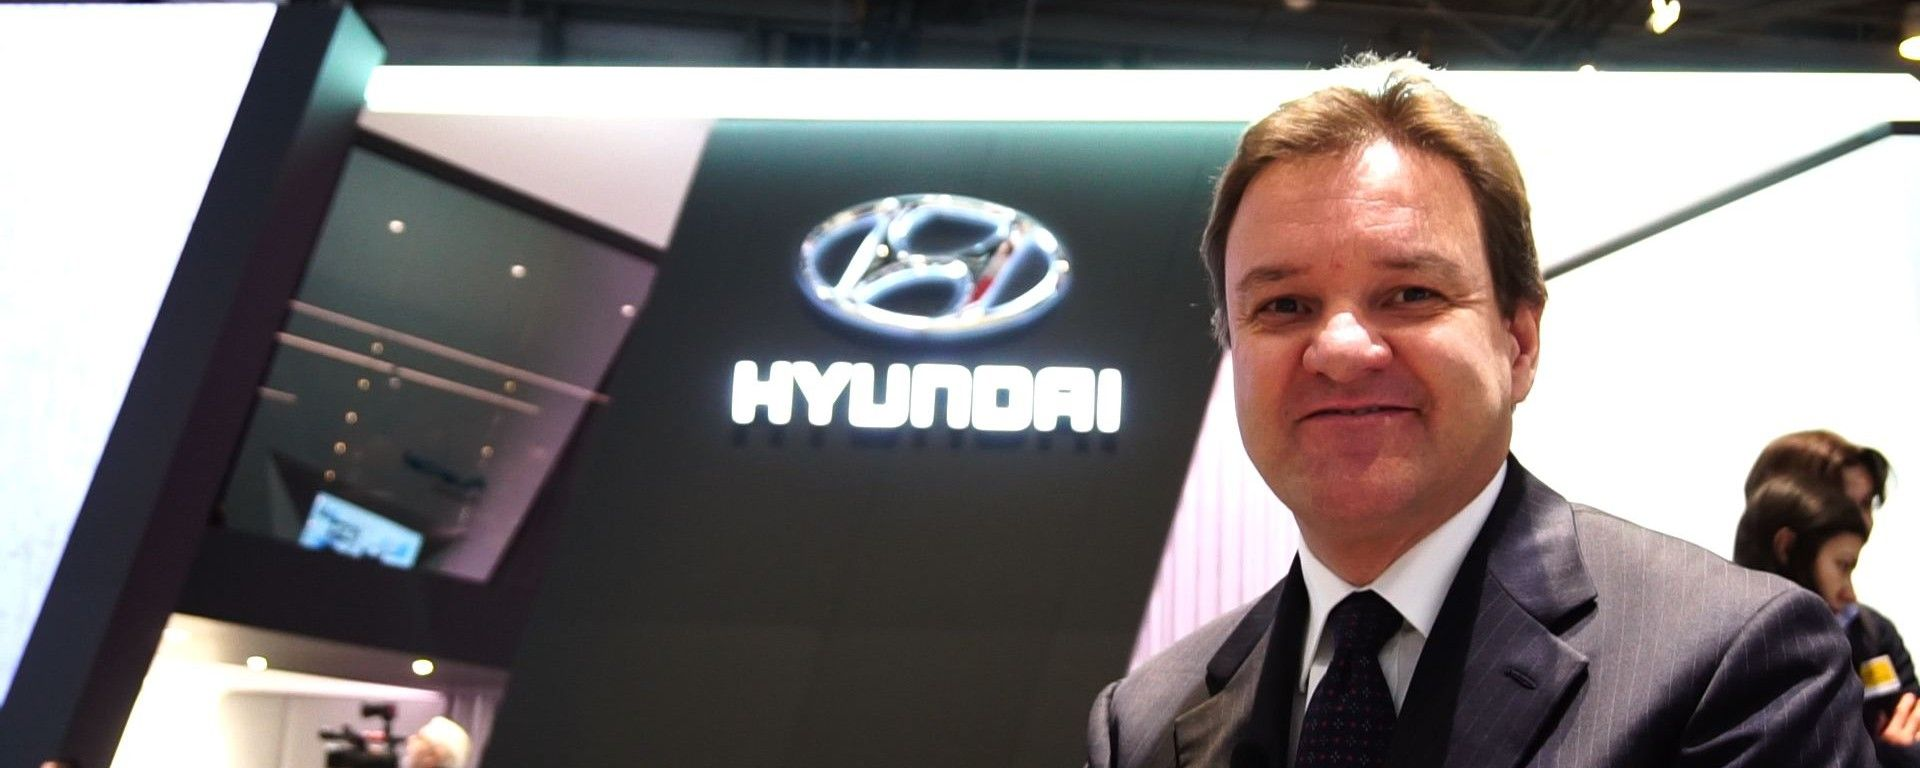 Hyundai i30 Wagon: ce ne parla Andrea Crespi, Managing Director di Hyundai